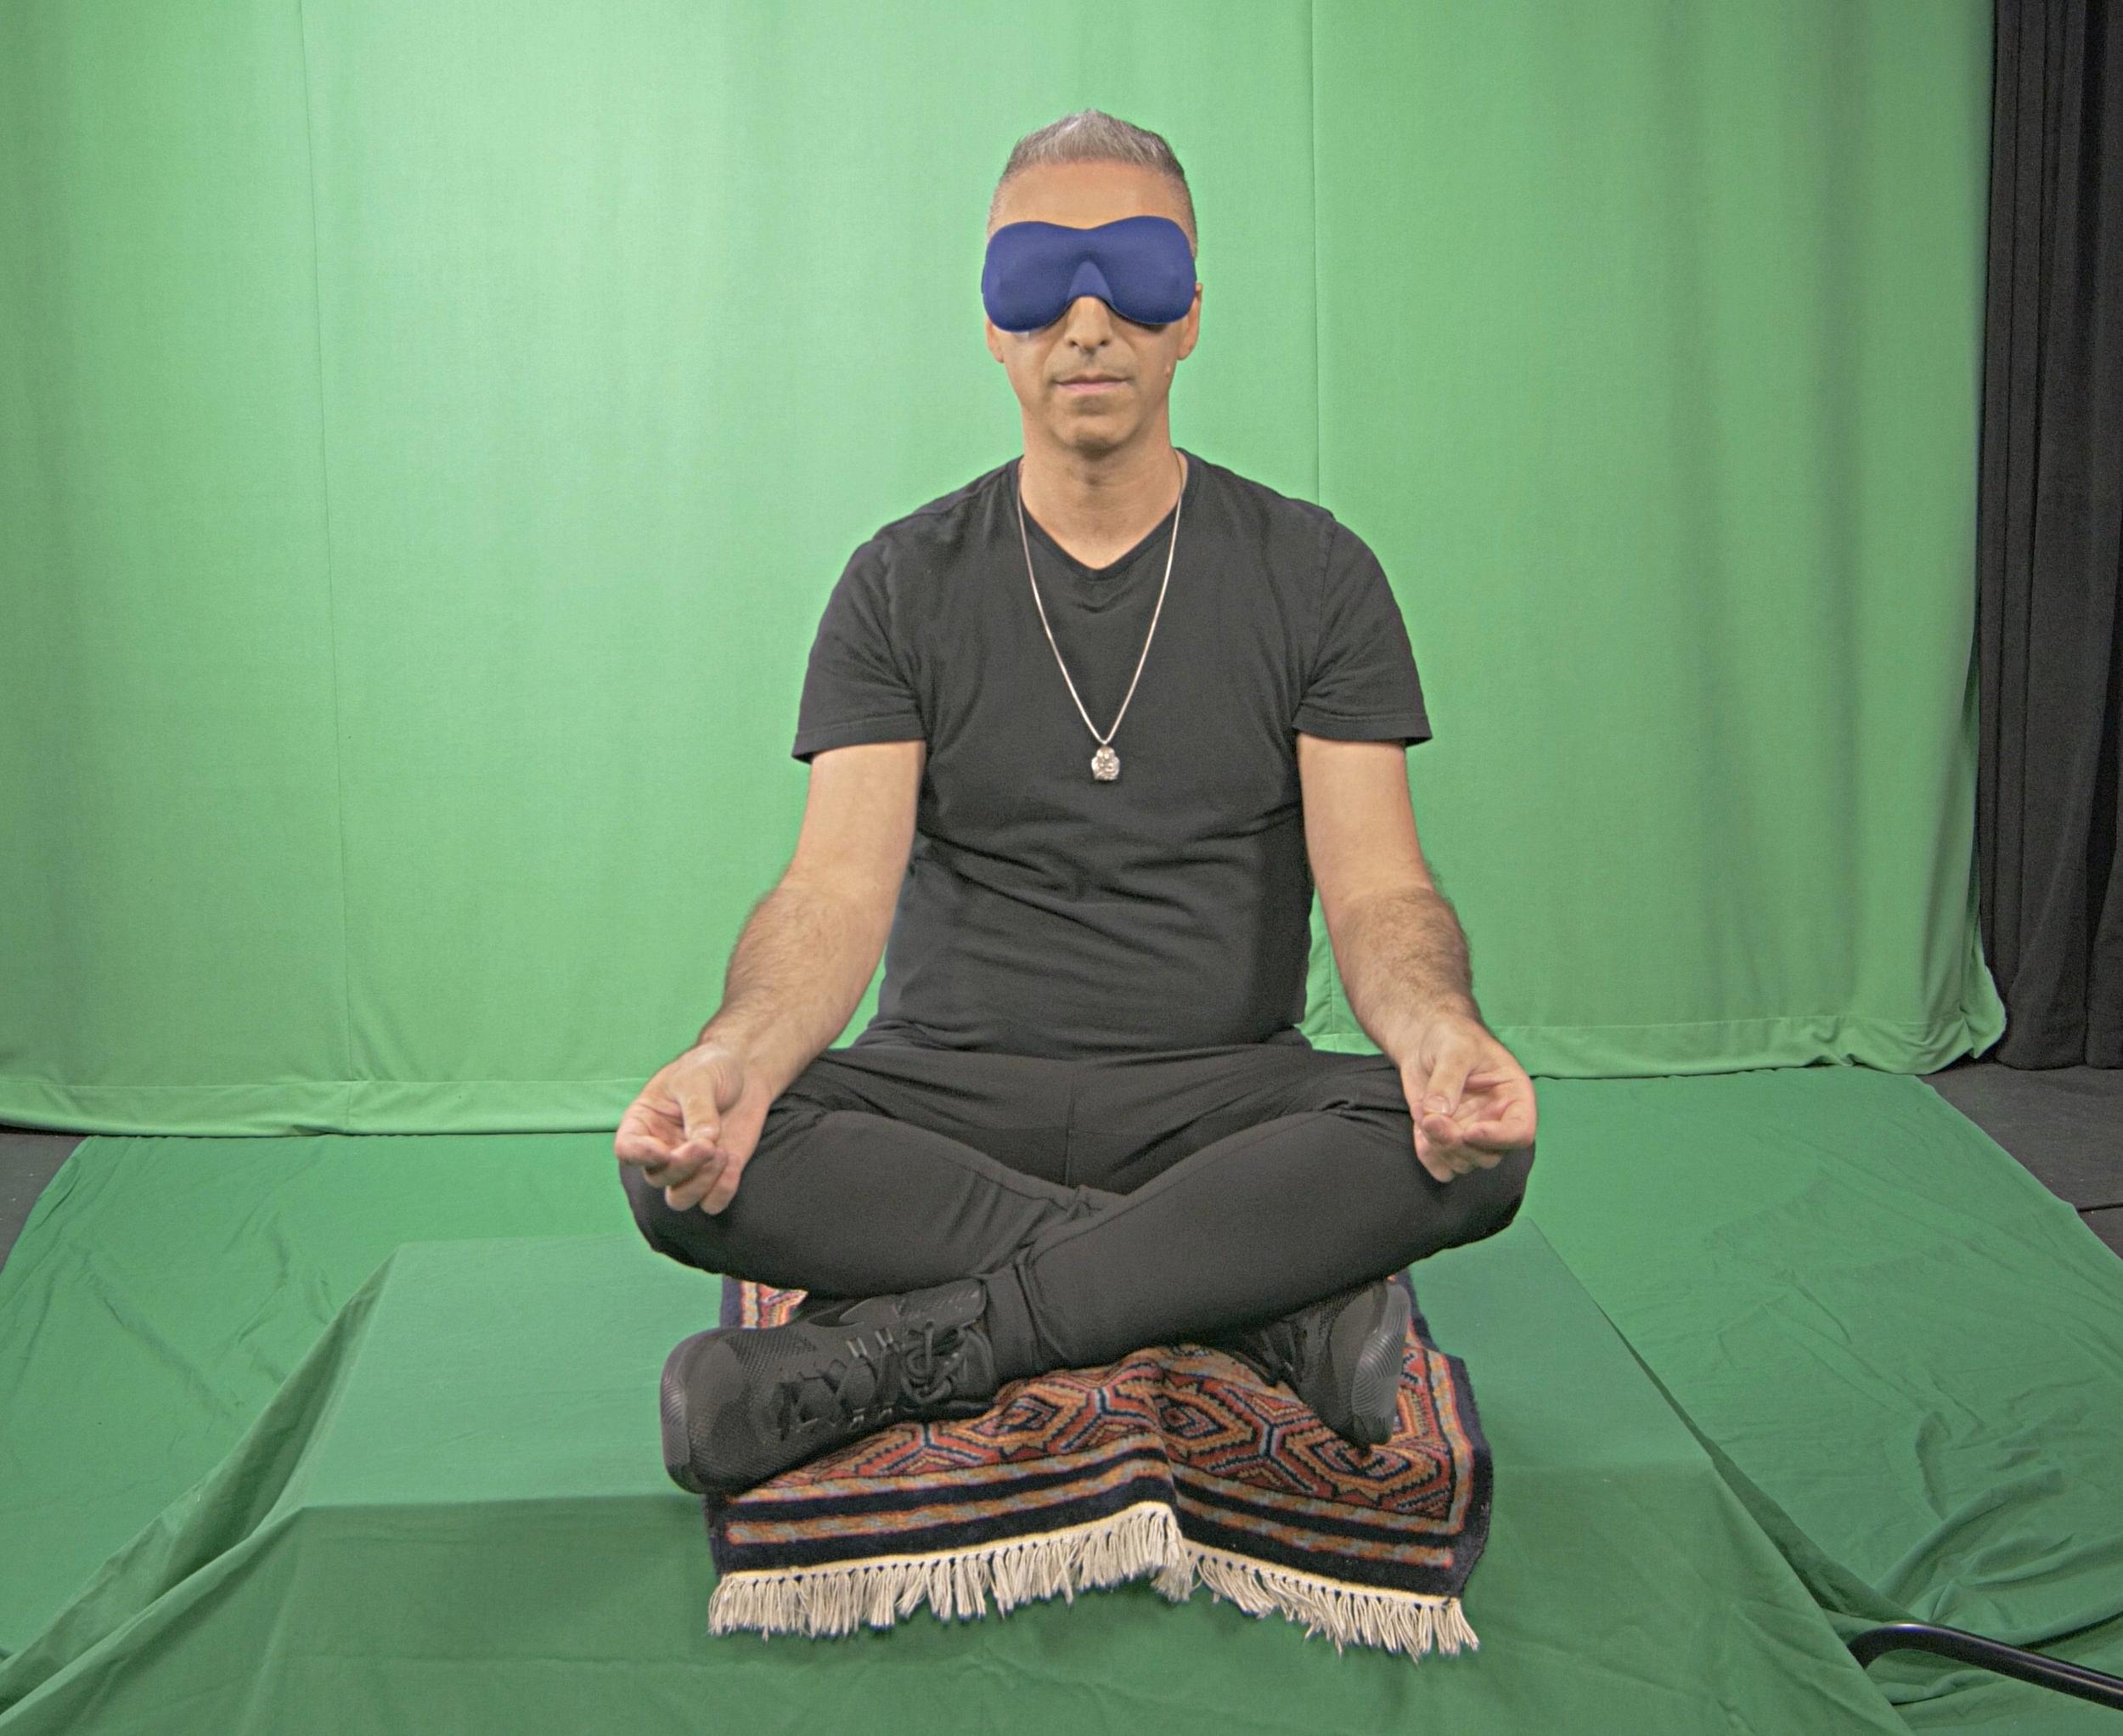 Mindful Dan - MT shoot (Dan & Sleep Mask).jpg